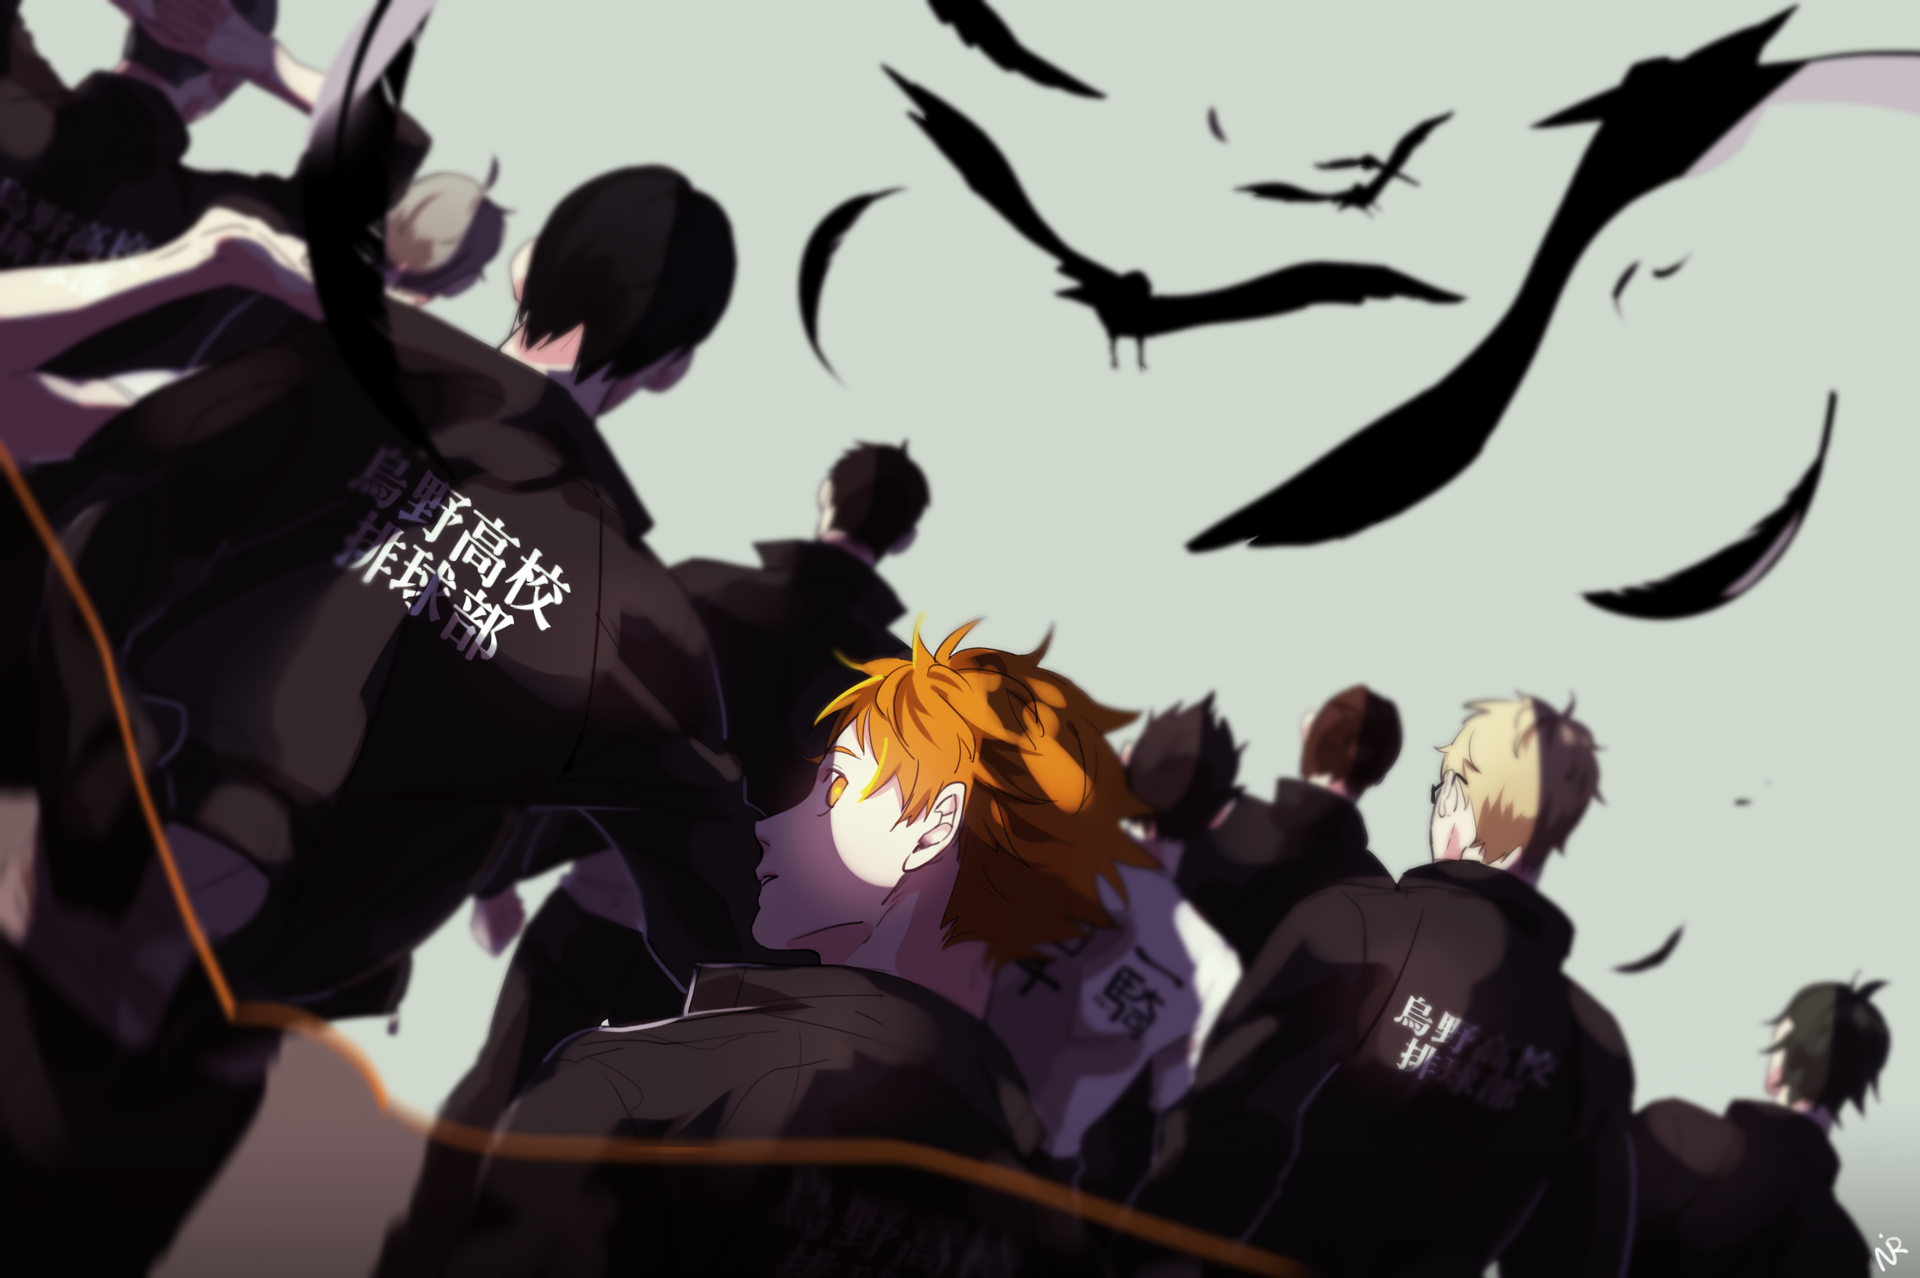 Haikyu!! HD Wallpaper | Background Image | 1920x1278 | ID:699054